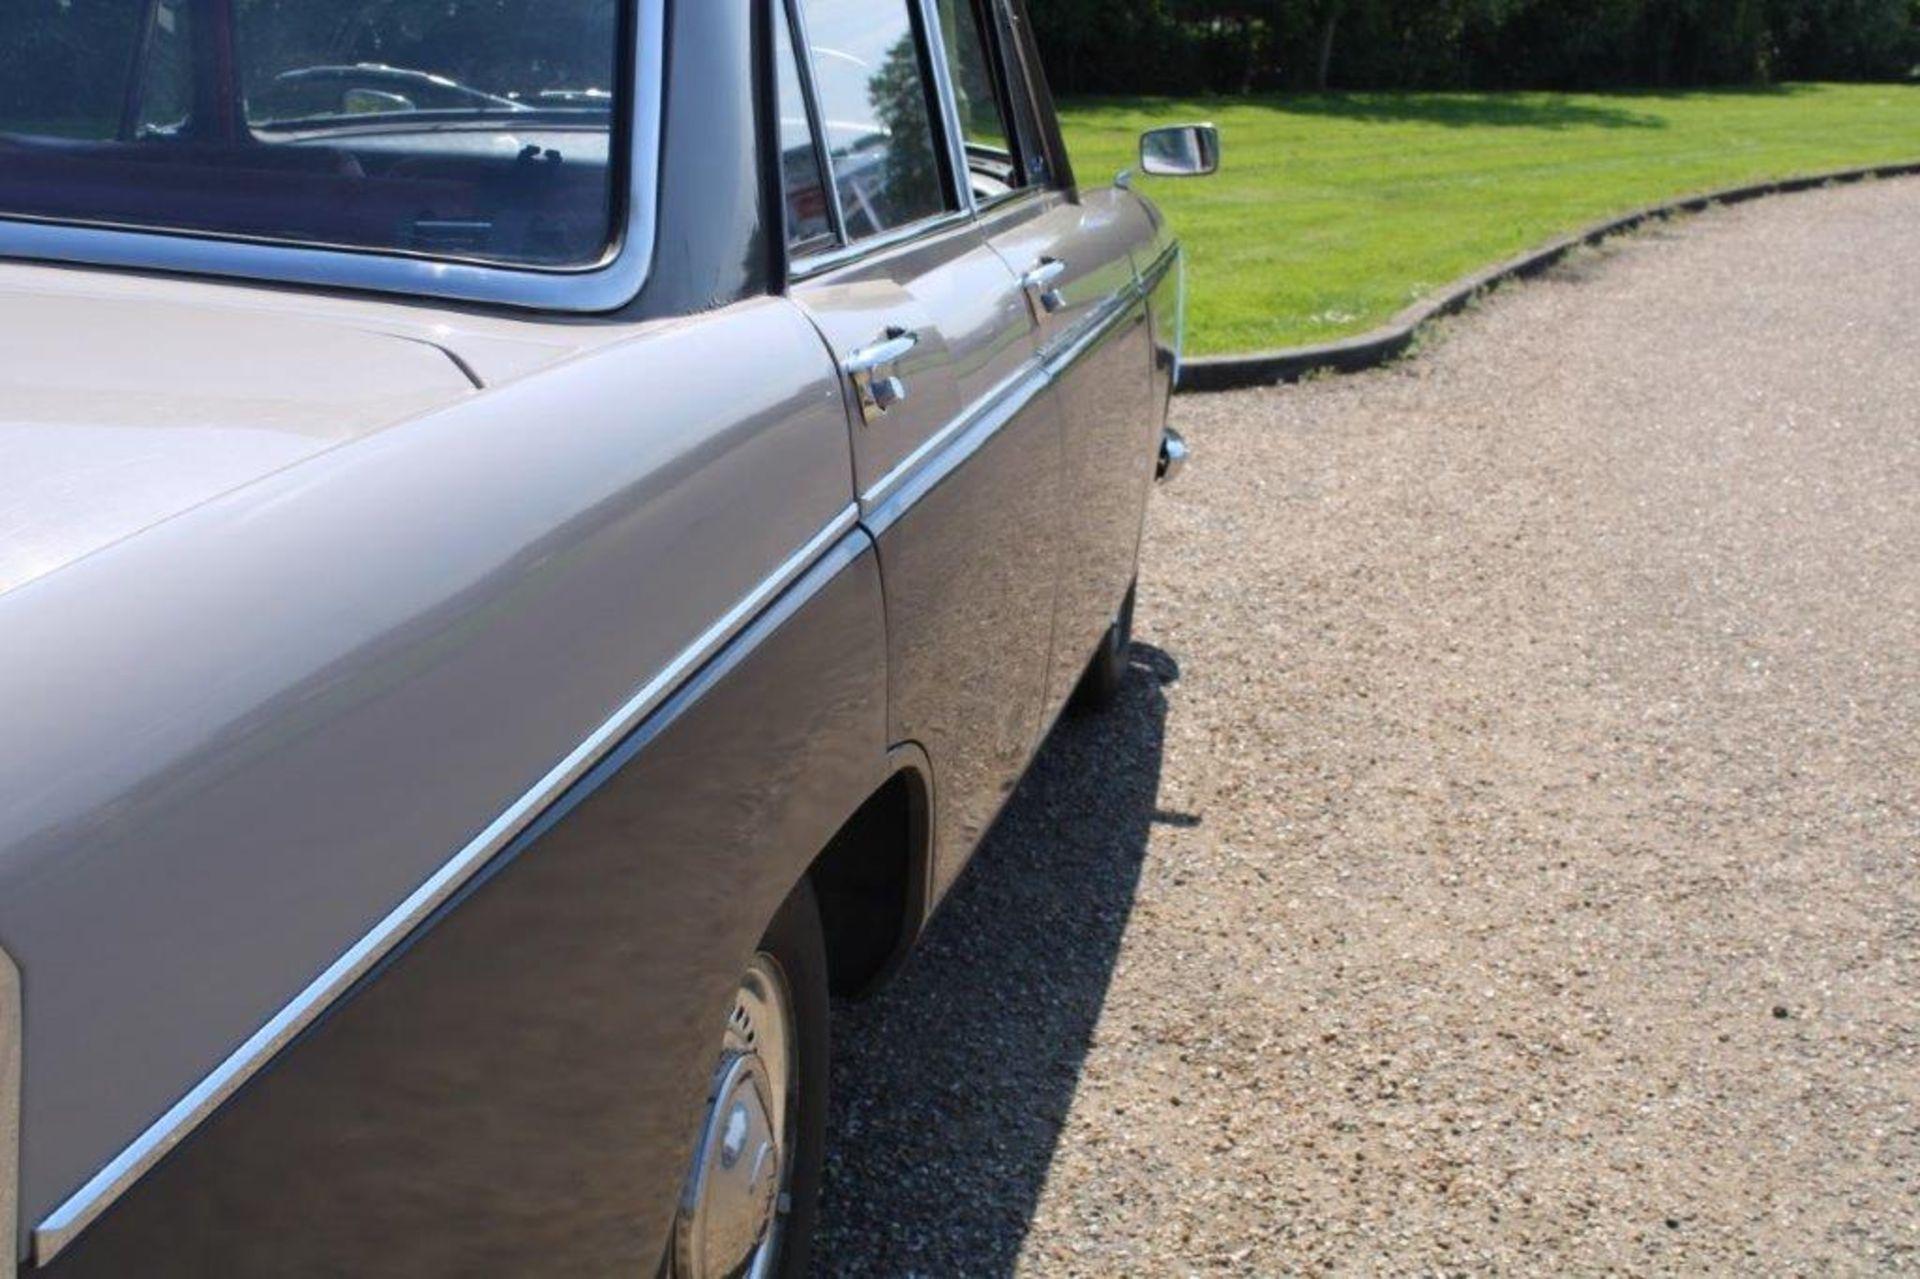 1969 Wolseley 16/60 Auto - Image 9 of 31